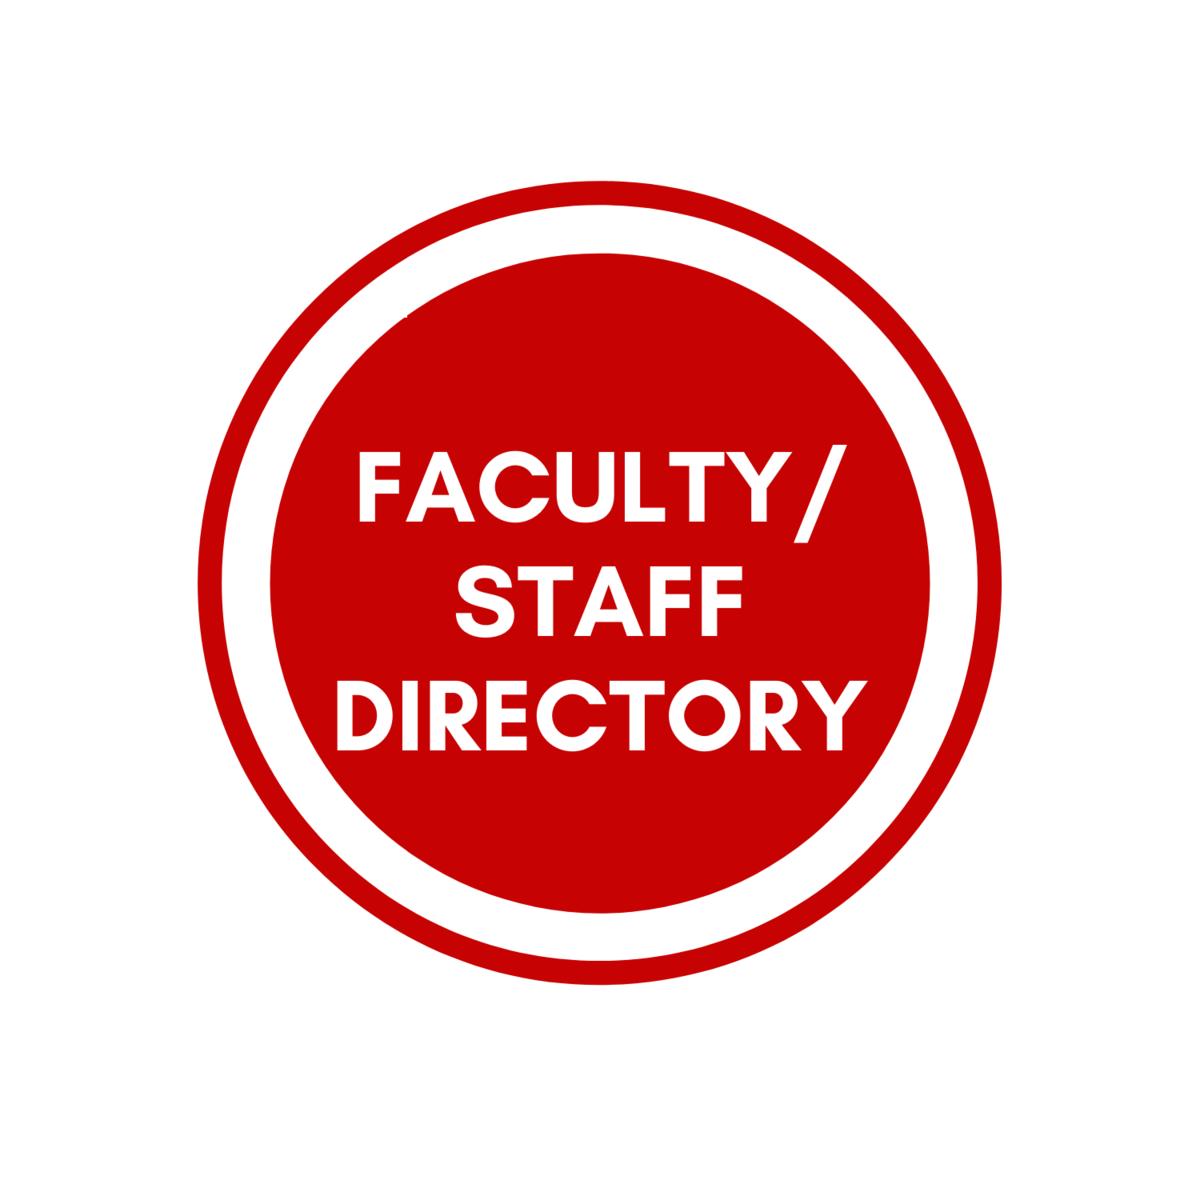 fac/staff Directory